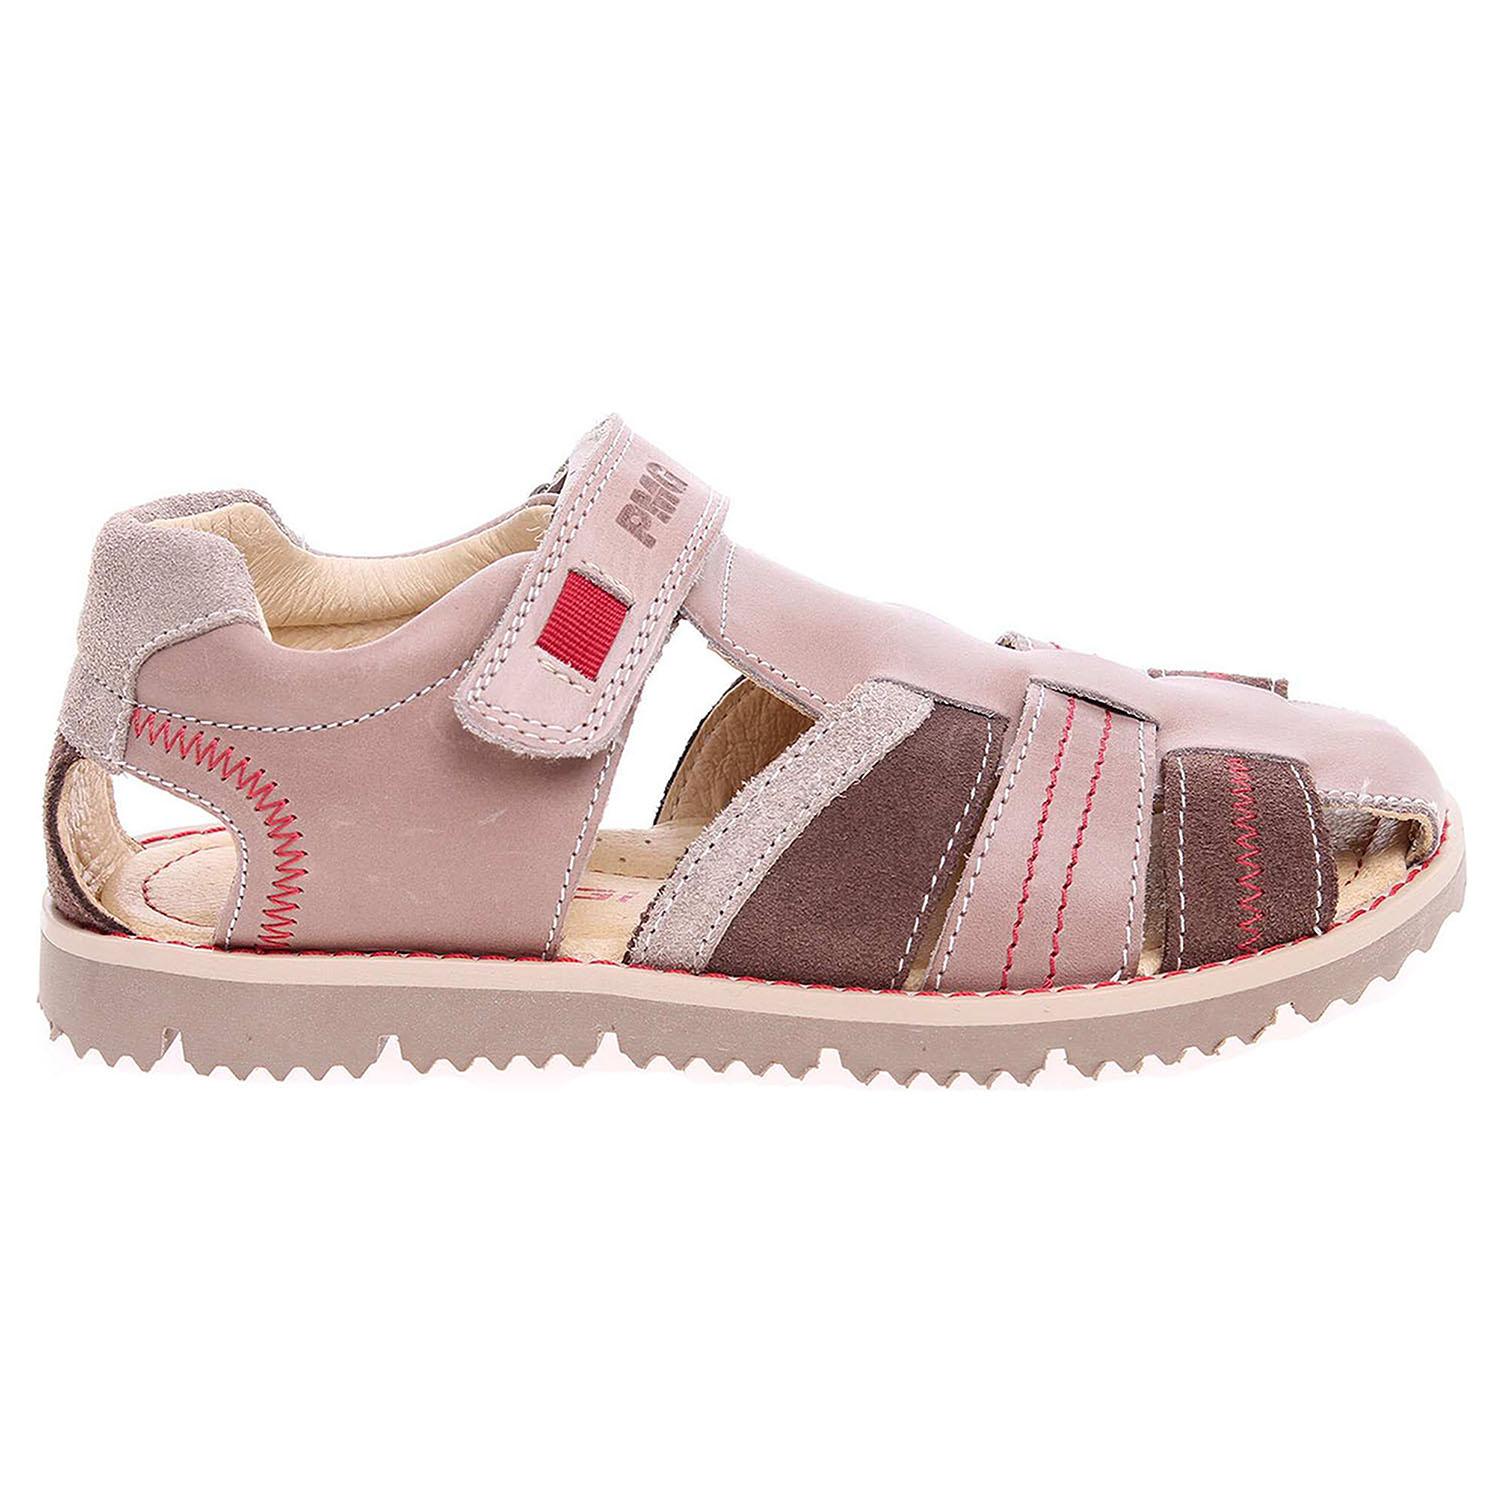 Ecco Primigi chlapecké sandály 7128300 hnědé 29300070